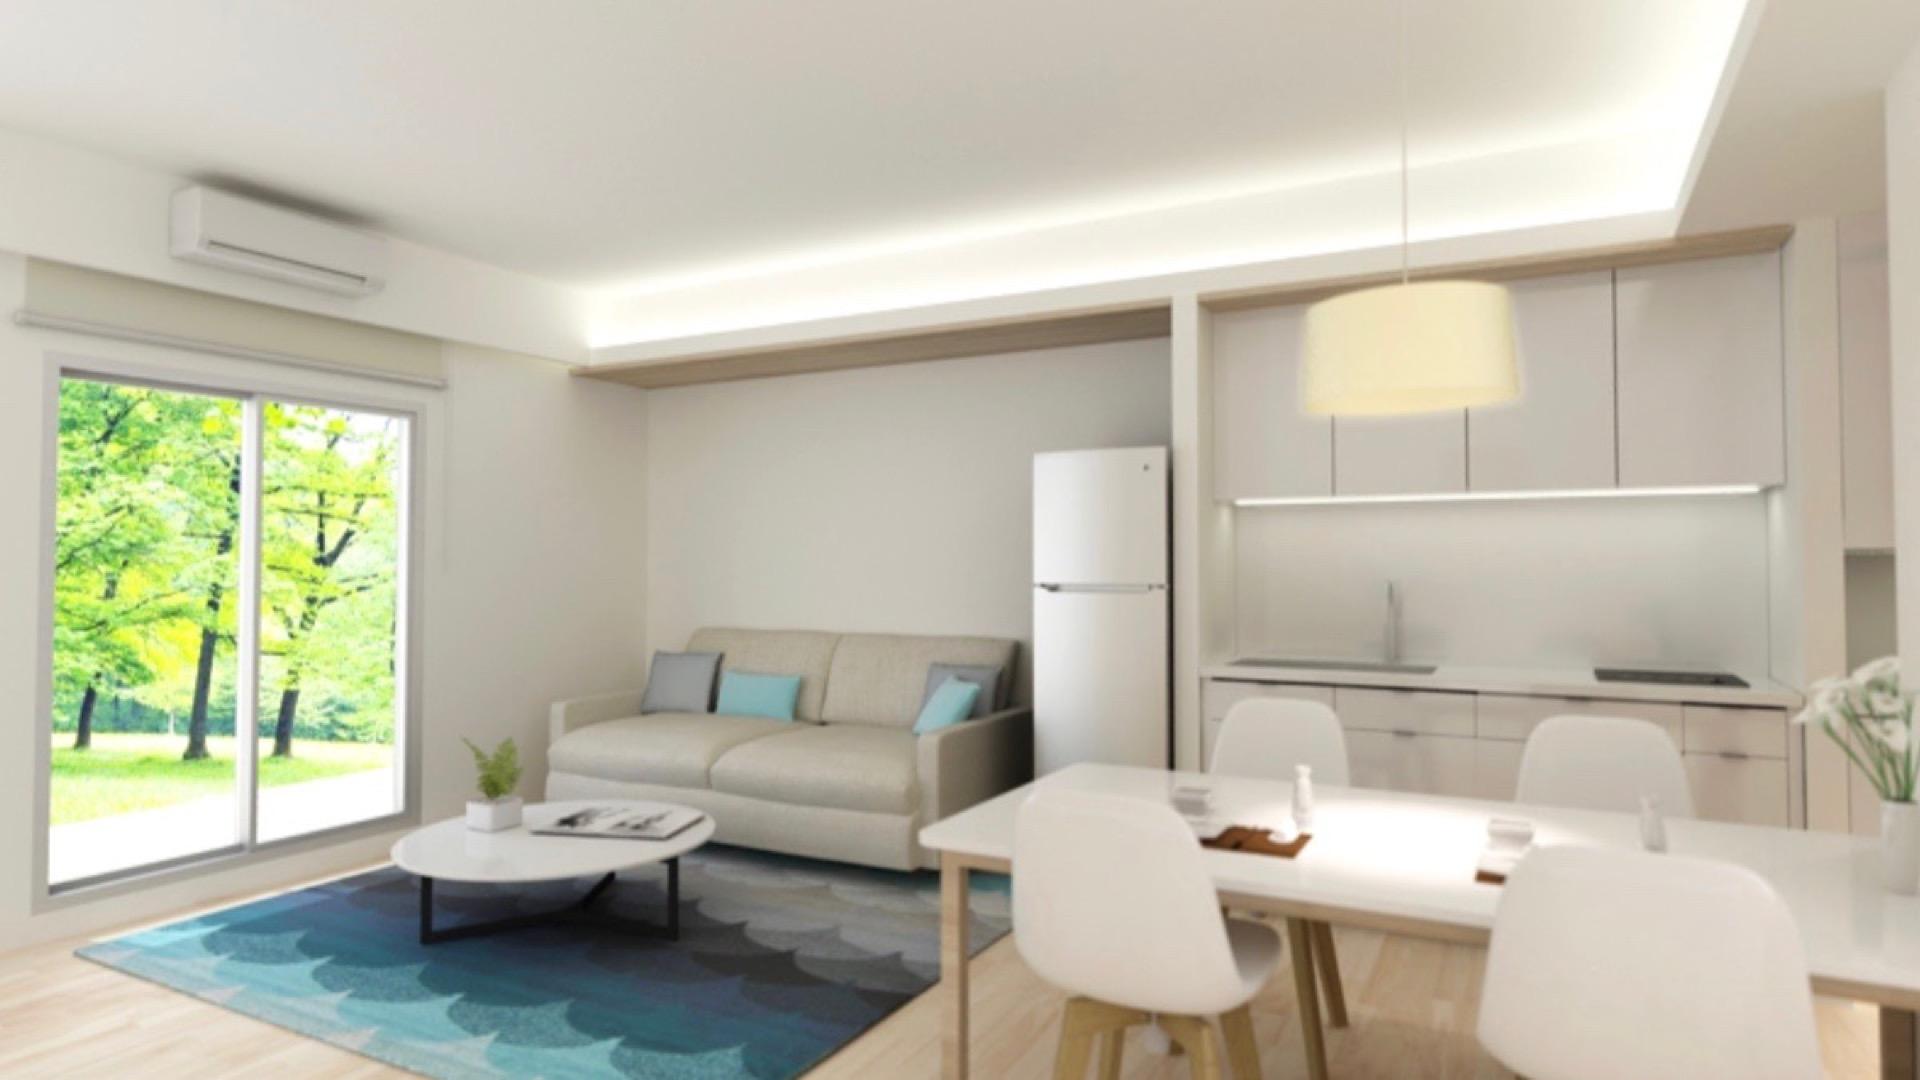 德築-DEZU-project-Zuyin-architecture-building-perspective-2